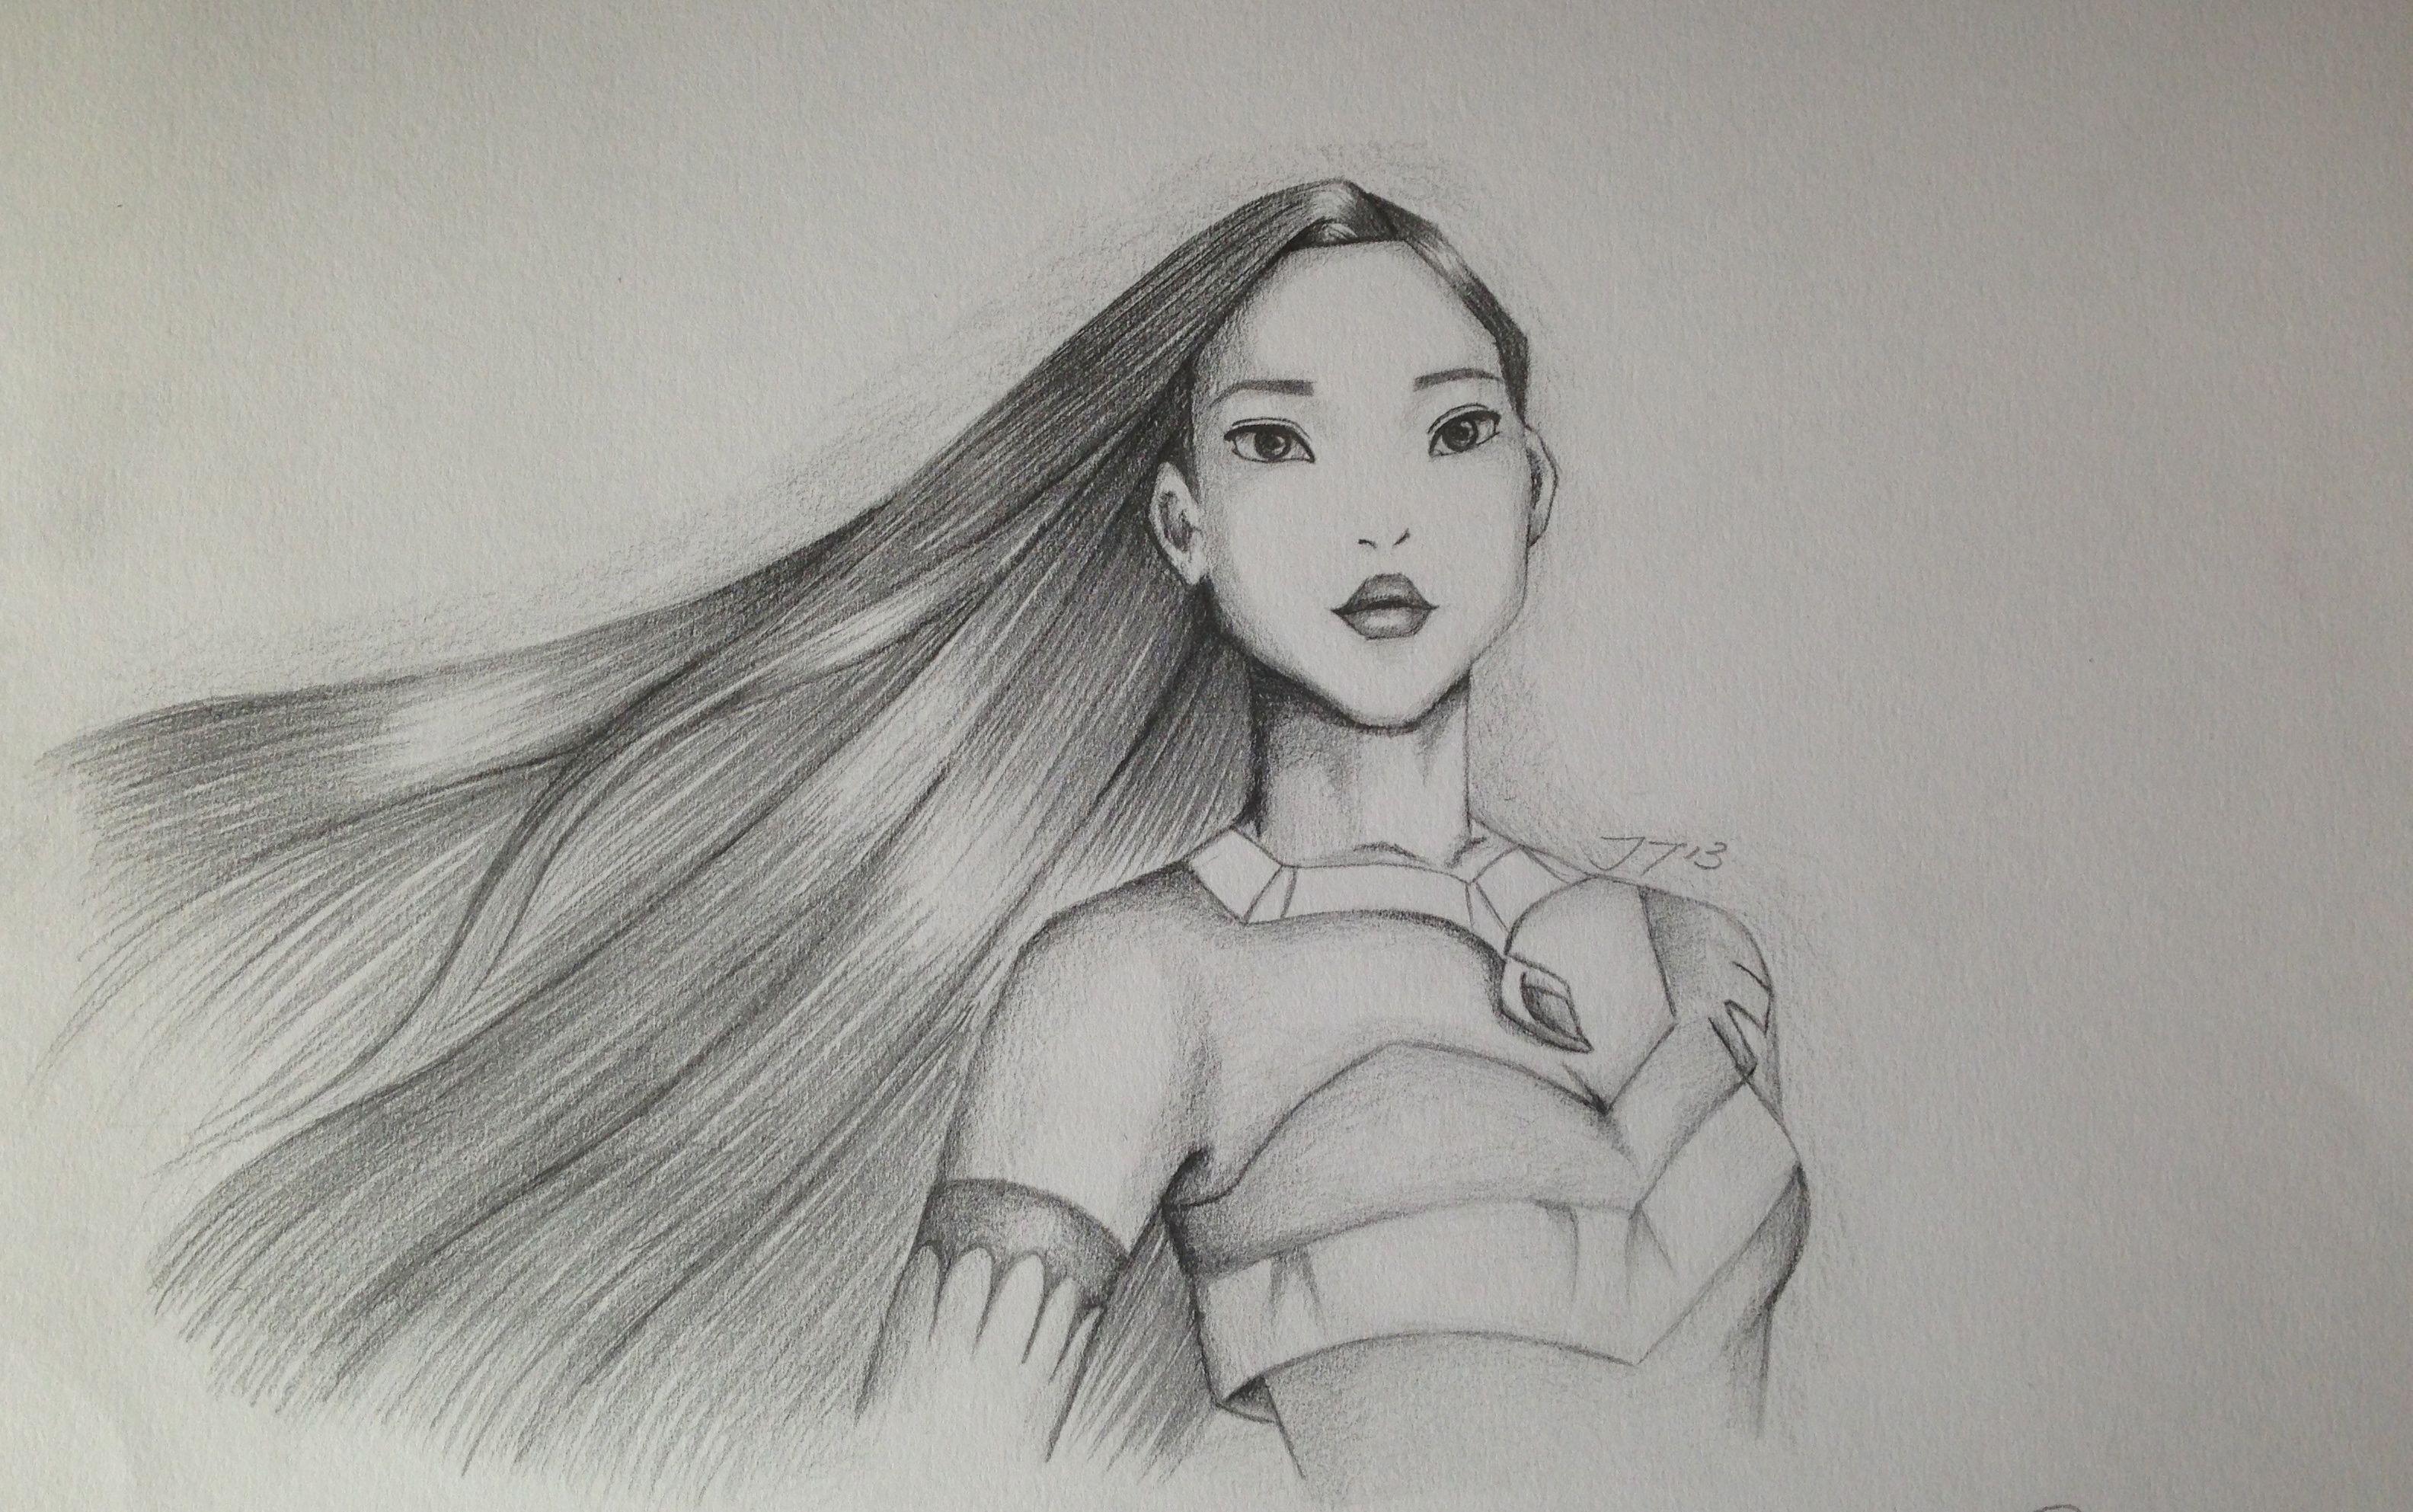 Pencil drawing of Pocahontas | Pocahontas drawing, Pencil ...